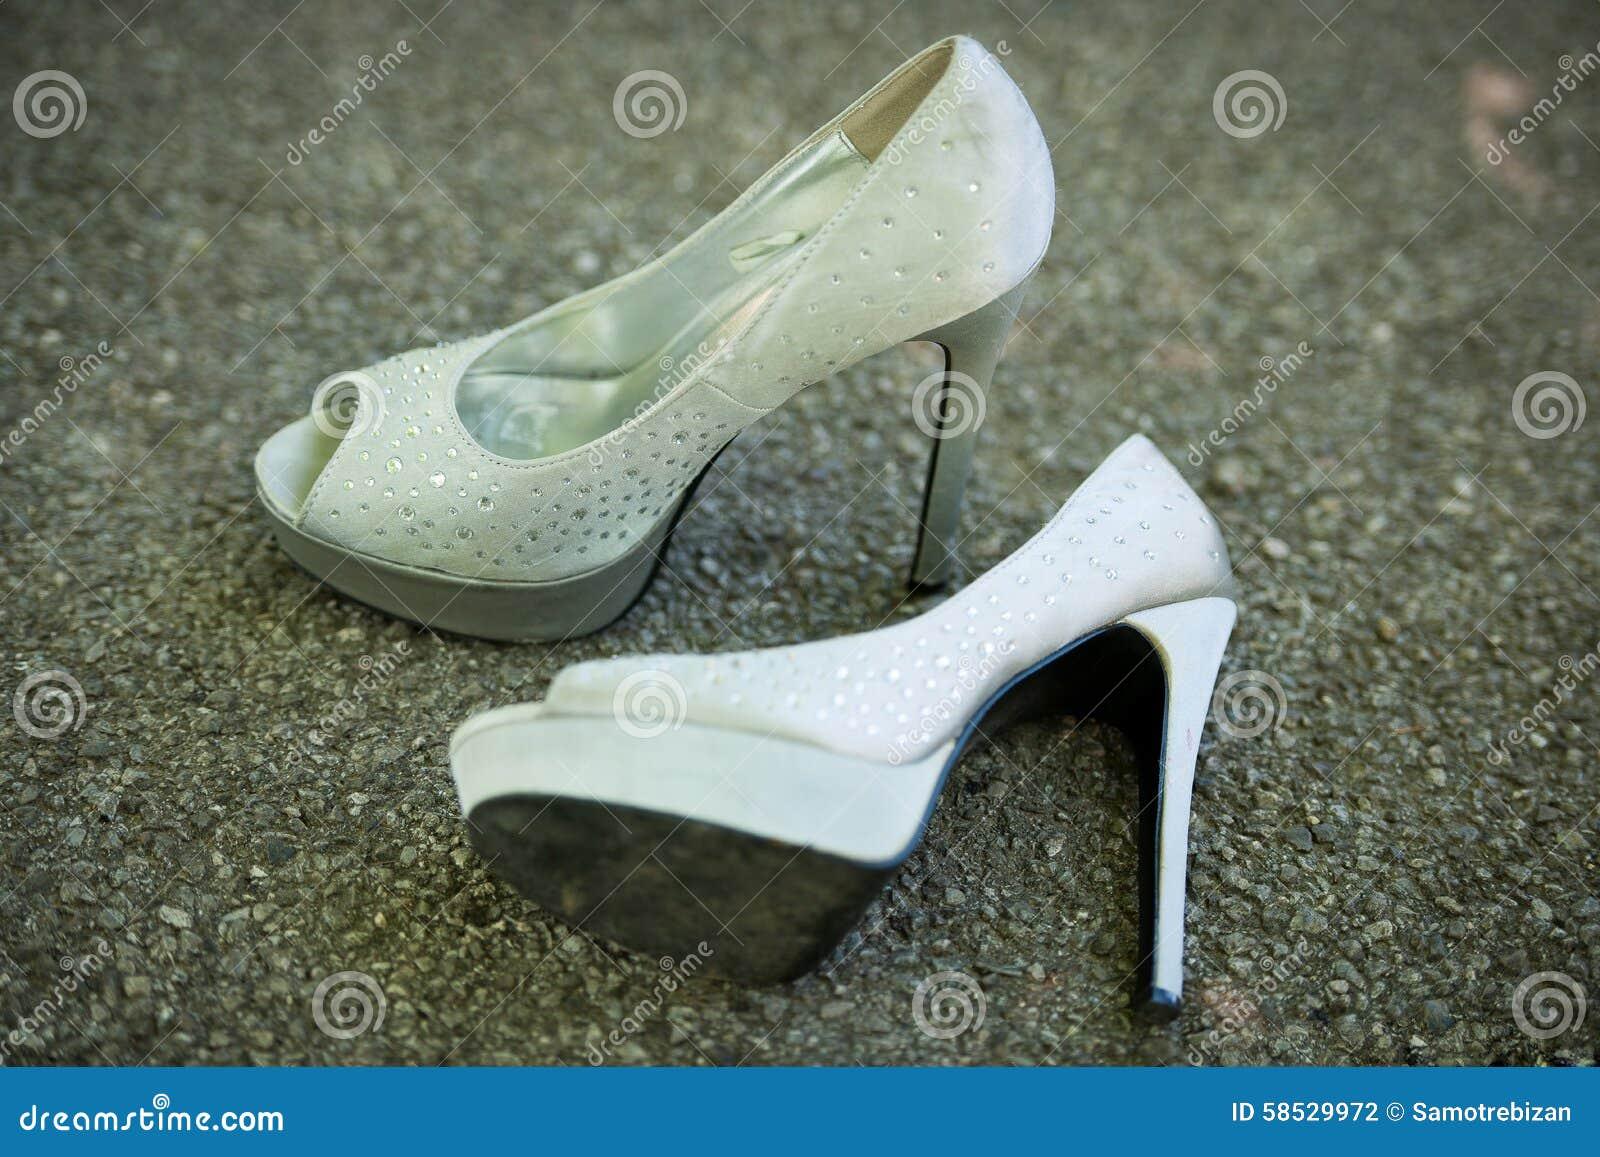 d09cd93b1dc Ασημένια παπούτσια γυναικών με τα υψηλά τακούνια στο πάτωμα. Οι Σχεδιαστές  Επέλεξαν Επίσης αυτές τις Στοκ Φωτογραφίες